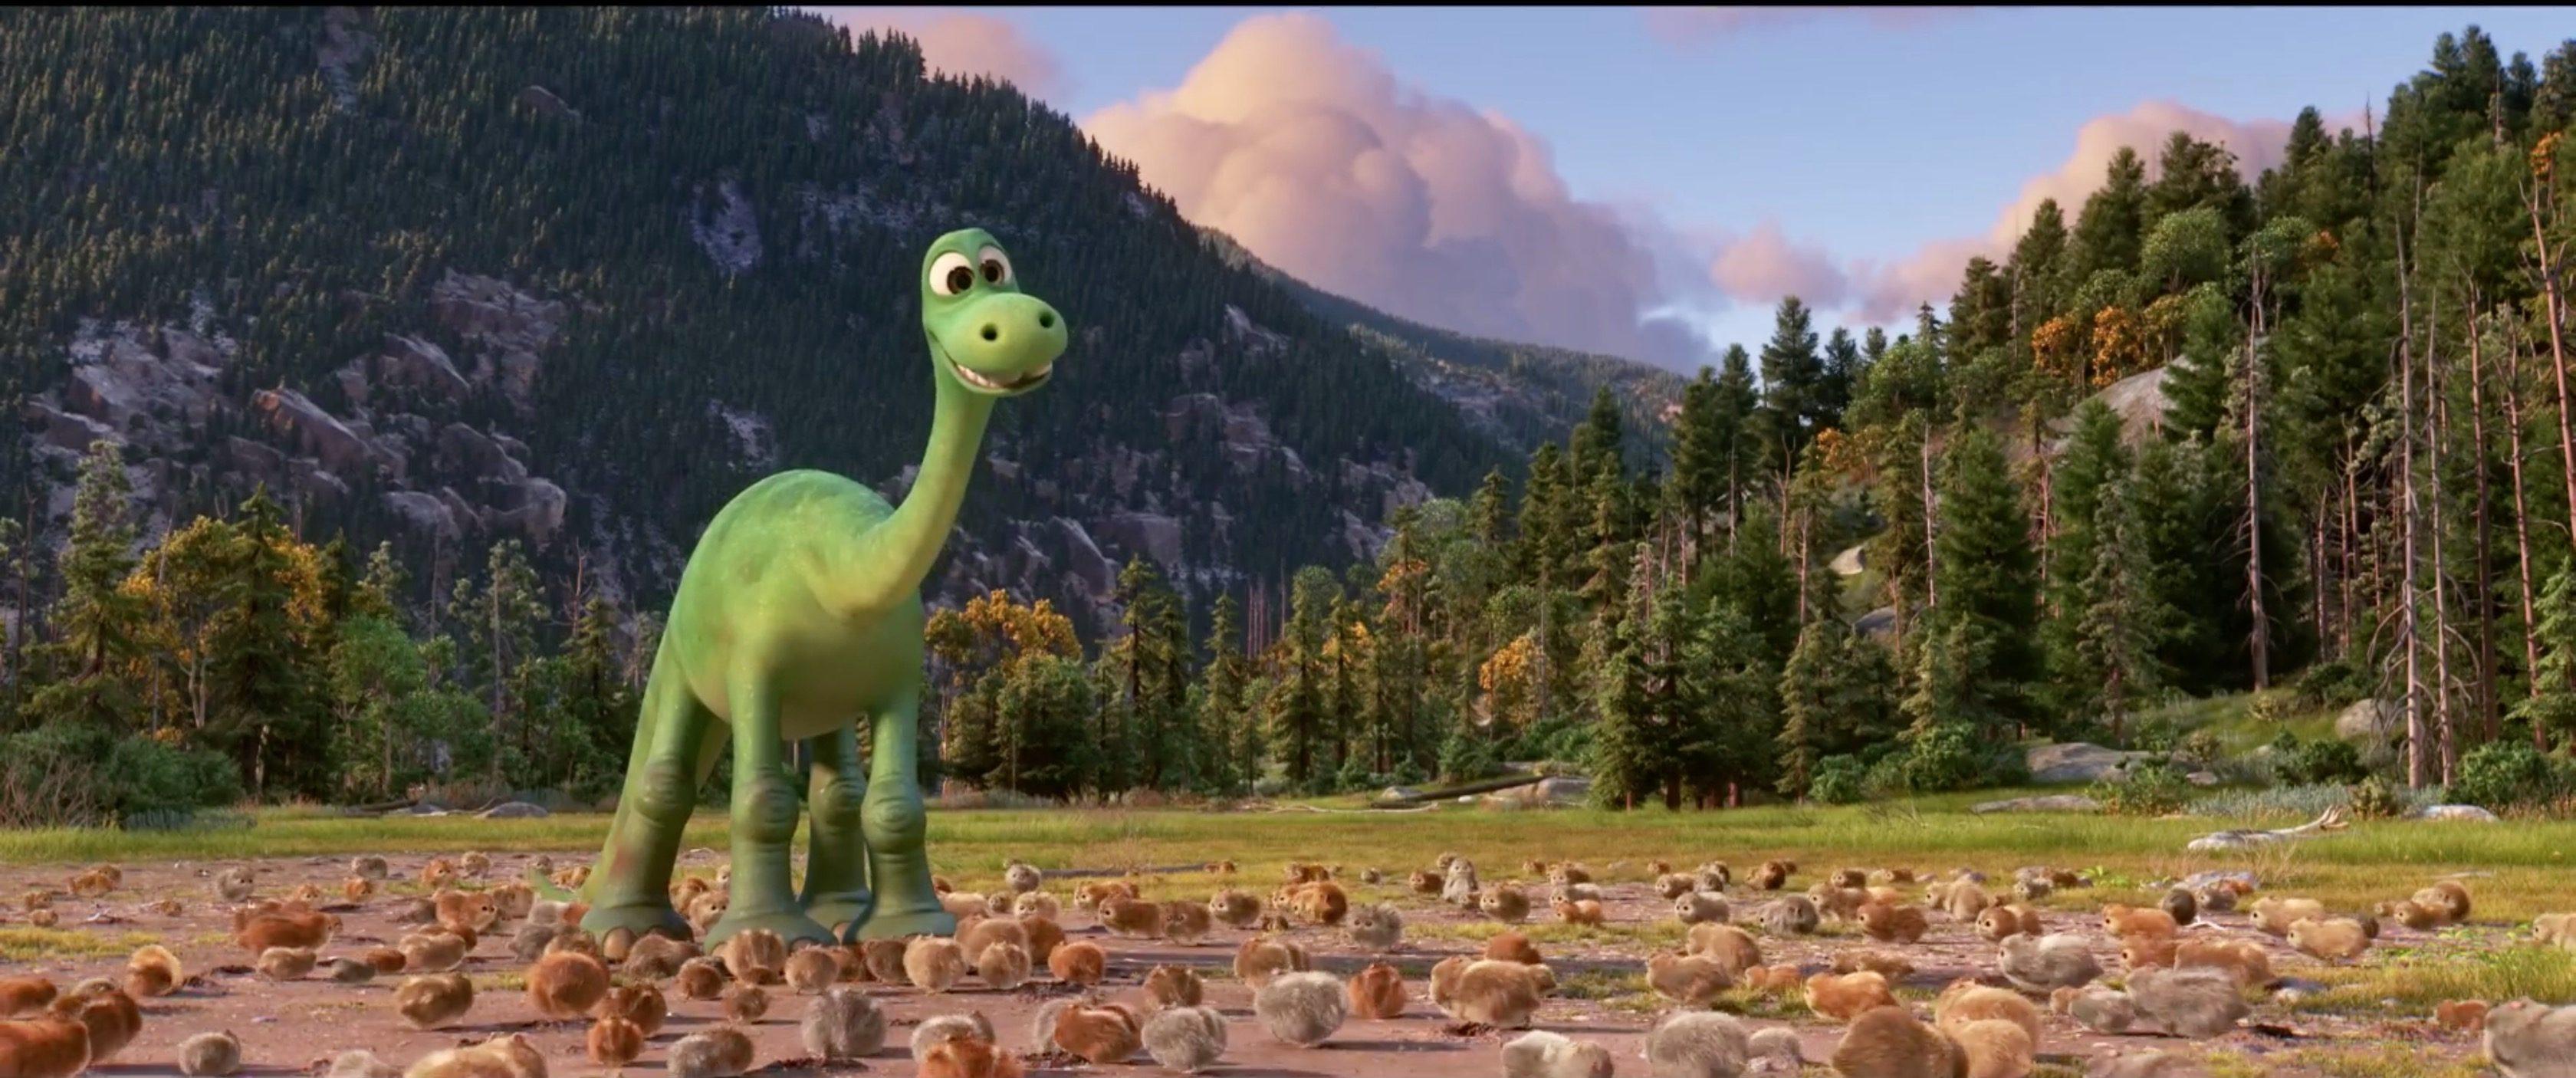 Triceratops The Good Dinosaur: The Good Dinosaur Official Trailer #2